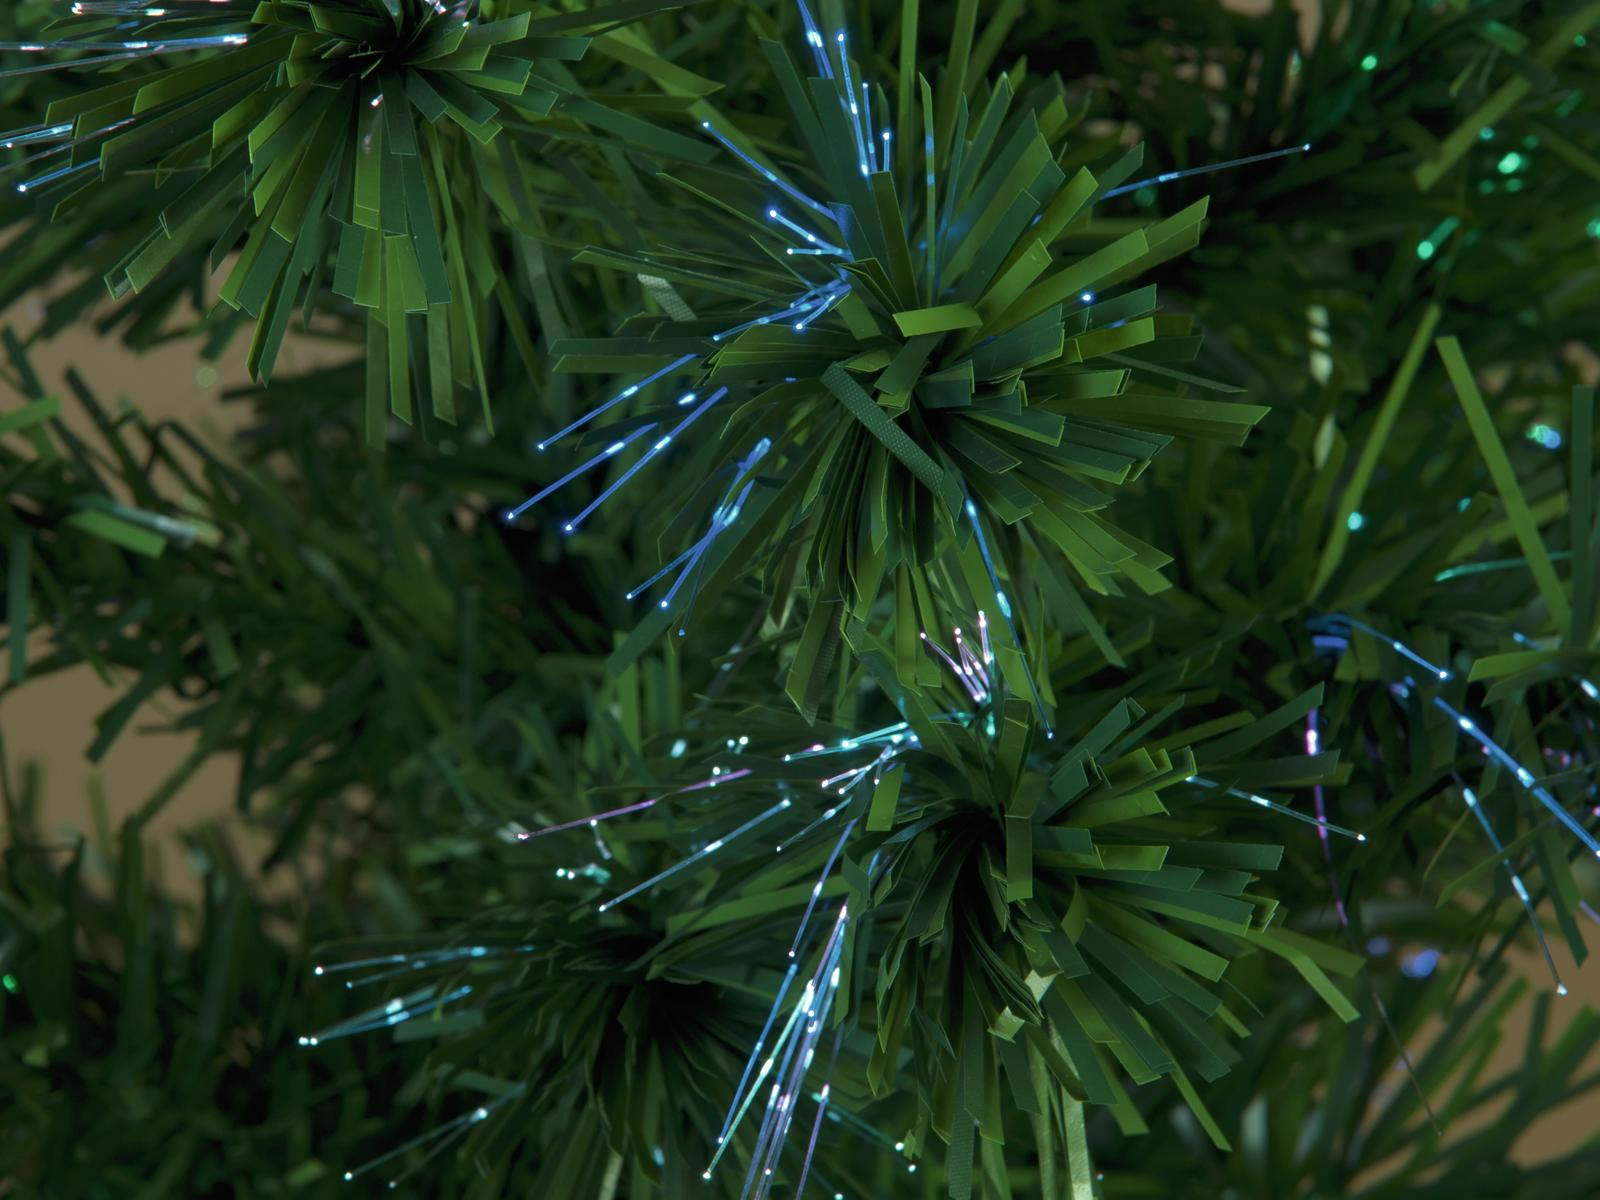 EUROPALMS albero di Natale in Fibra LED, 180 cm, verde